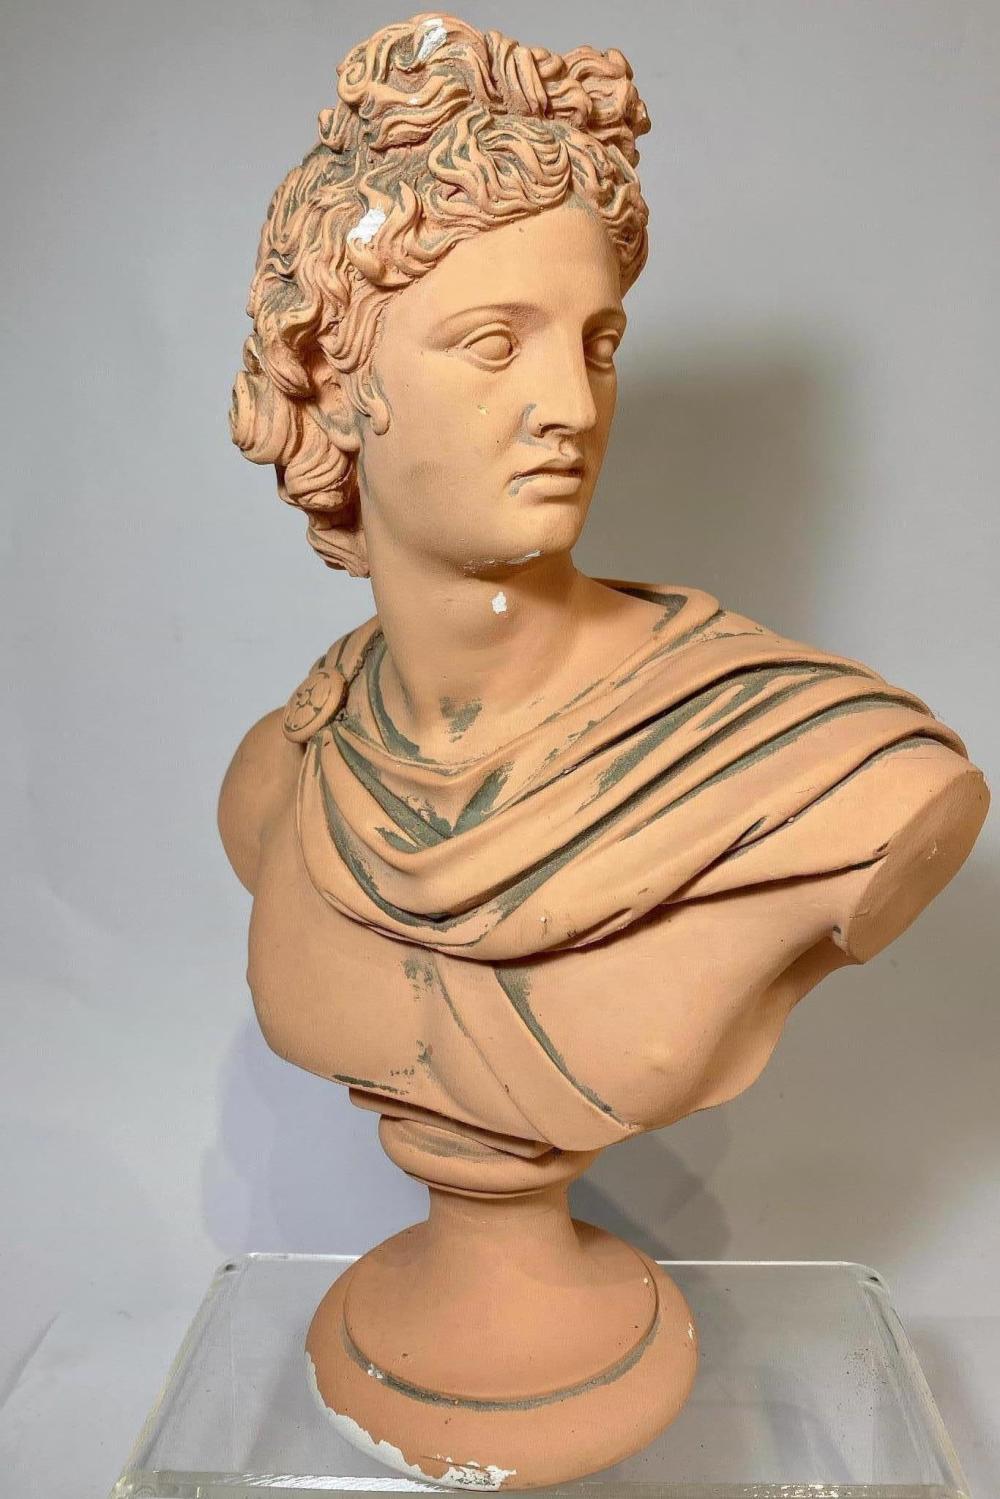 A Plaster Replica Bust of the Apollo Belvedere in Terracotta Faux Finish